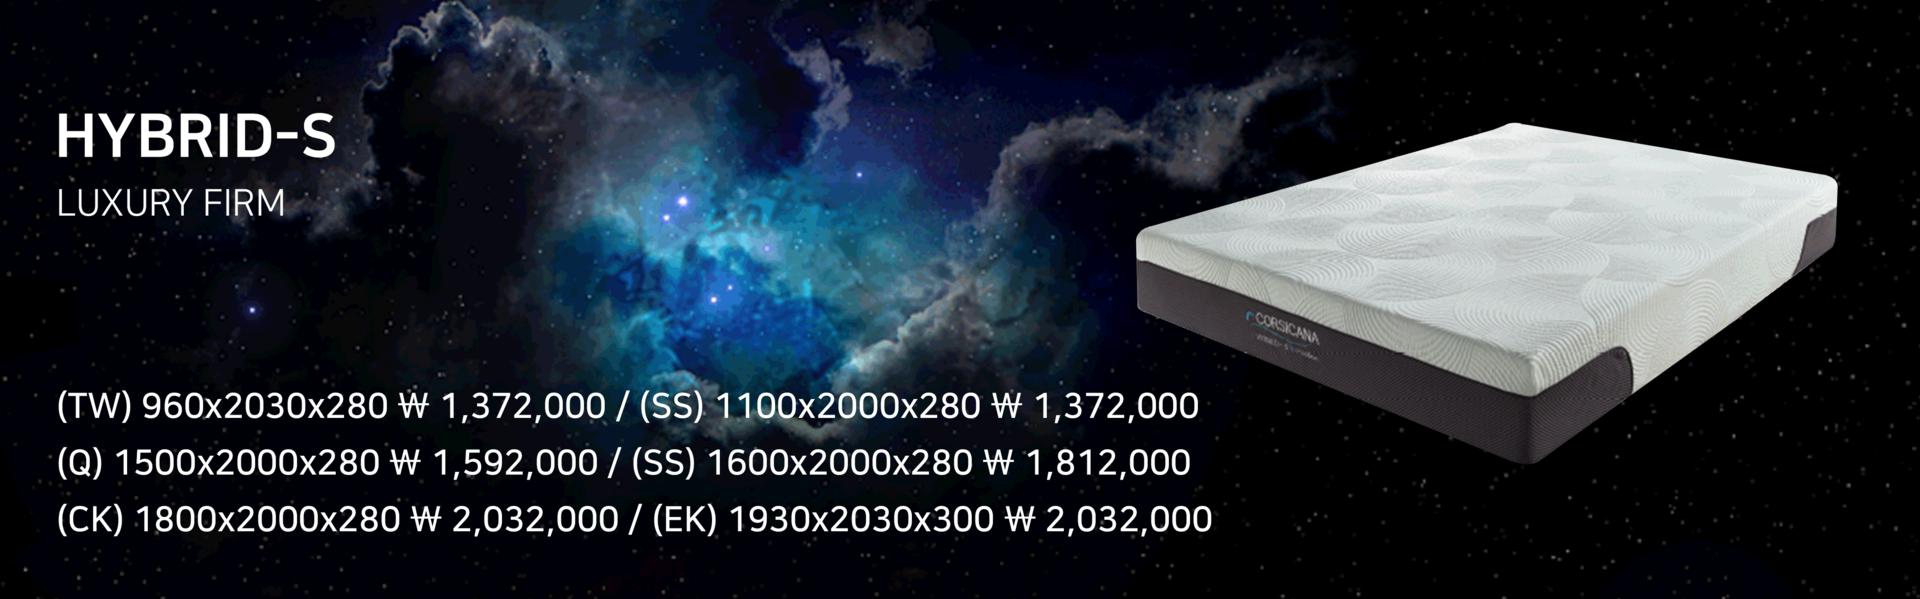 "<font size=""3px""><b>HYBRID-S<b></font><BR><FONT SIZE=""1PX"">LUXURY FIRM</FONT> <BR><br><font size=""0.5px""> (TW) 960x2030x280 ₩1,372,000  /  (SS) 1100x2000x280 ₩1,372,000 <br> (Q) 1500x2000x280 ₩1,592,000  /  (K) 1600x2000x280 ₩1,812,000    <br>(CK) 1800x2000x280 ₩2,032,000  /  (EK) 1930x2030x280 ₩2,032,000</font>"